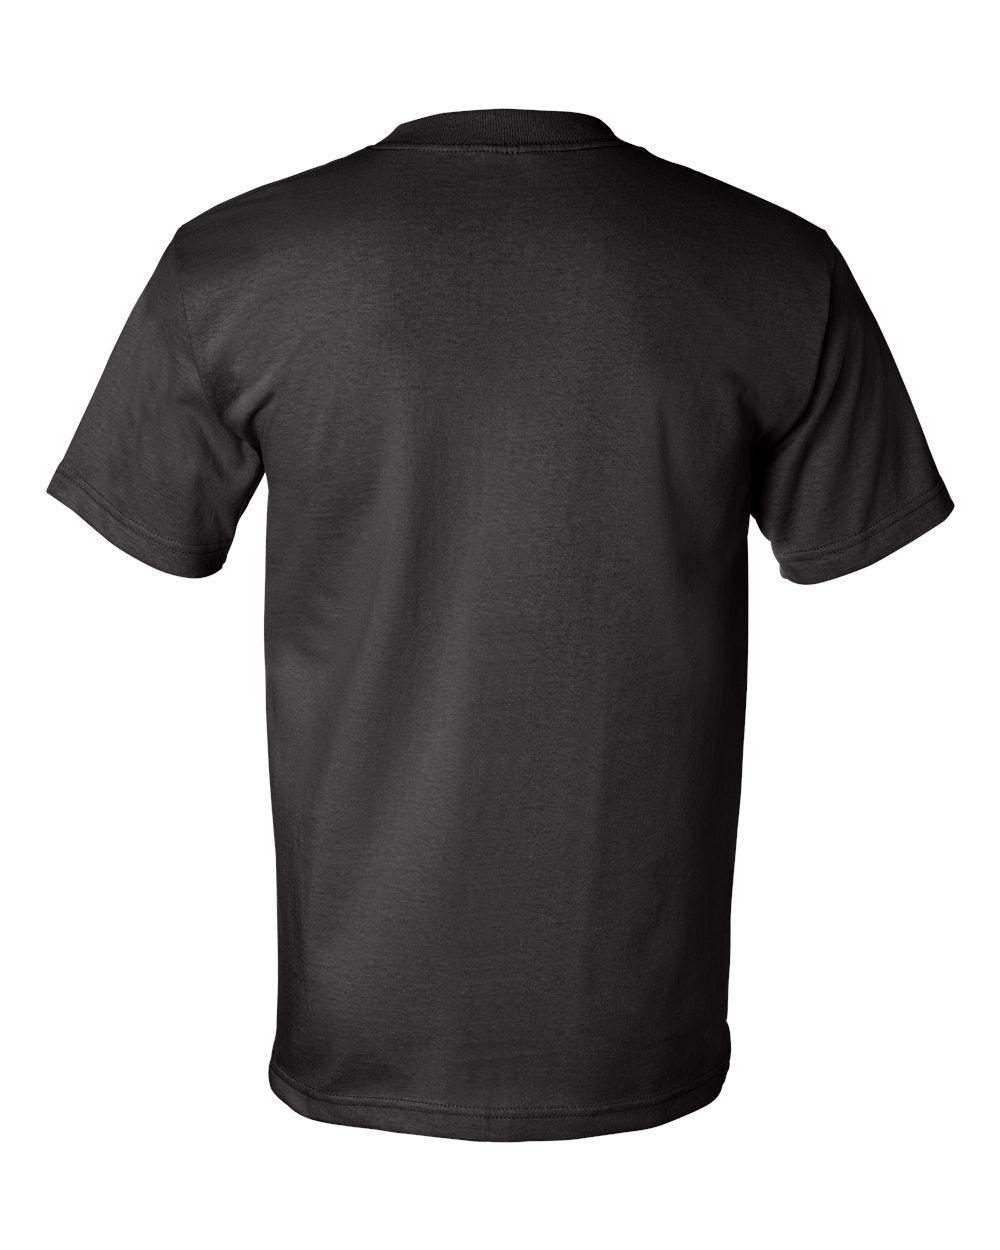 Bayside-Mens-Cotton-Blank-USA-Made-Short-Sleeve-T-Shirt-5100-up-to-5XL thumbnail 10